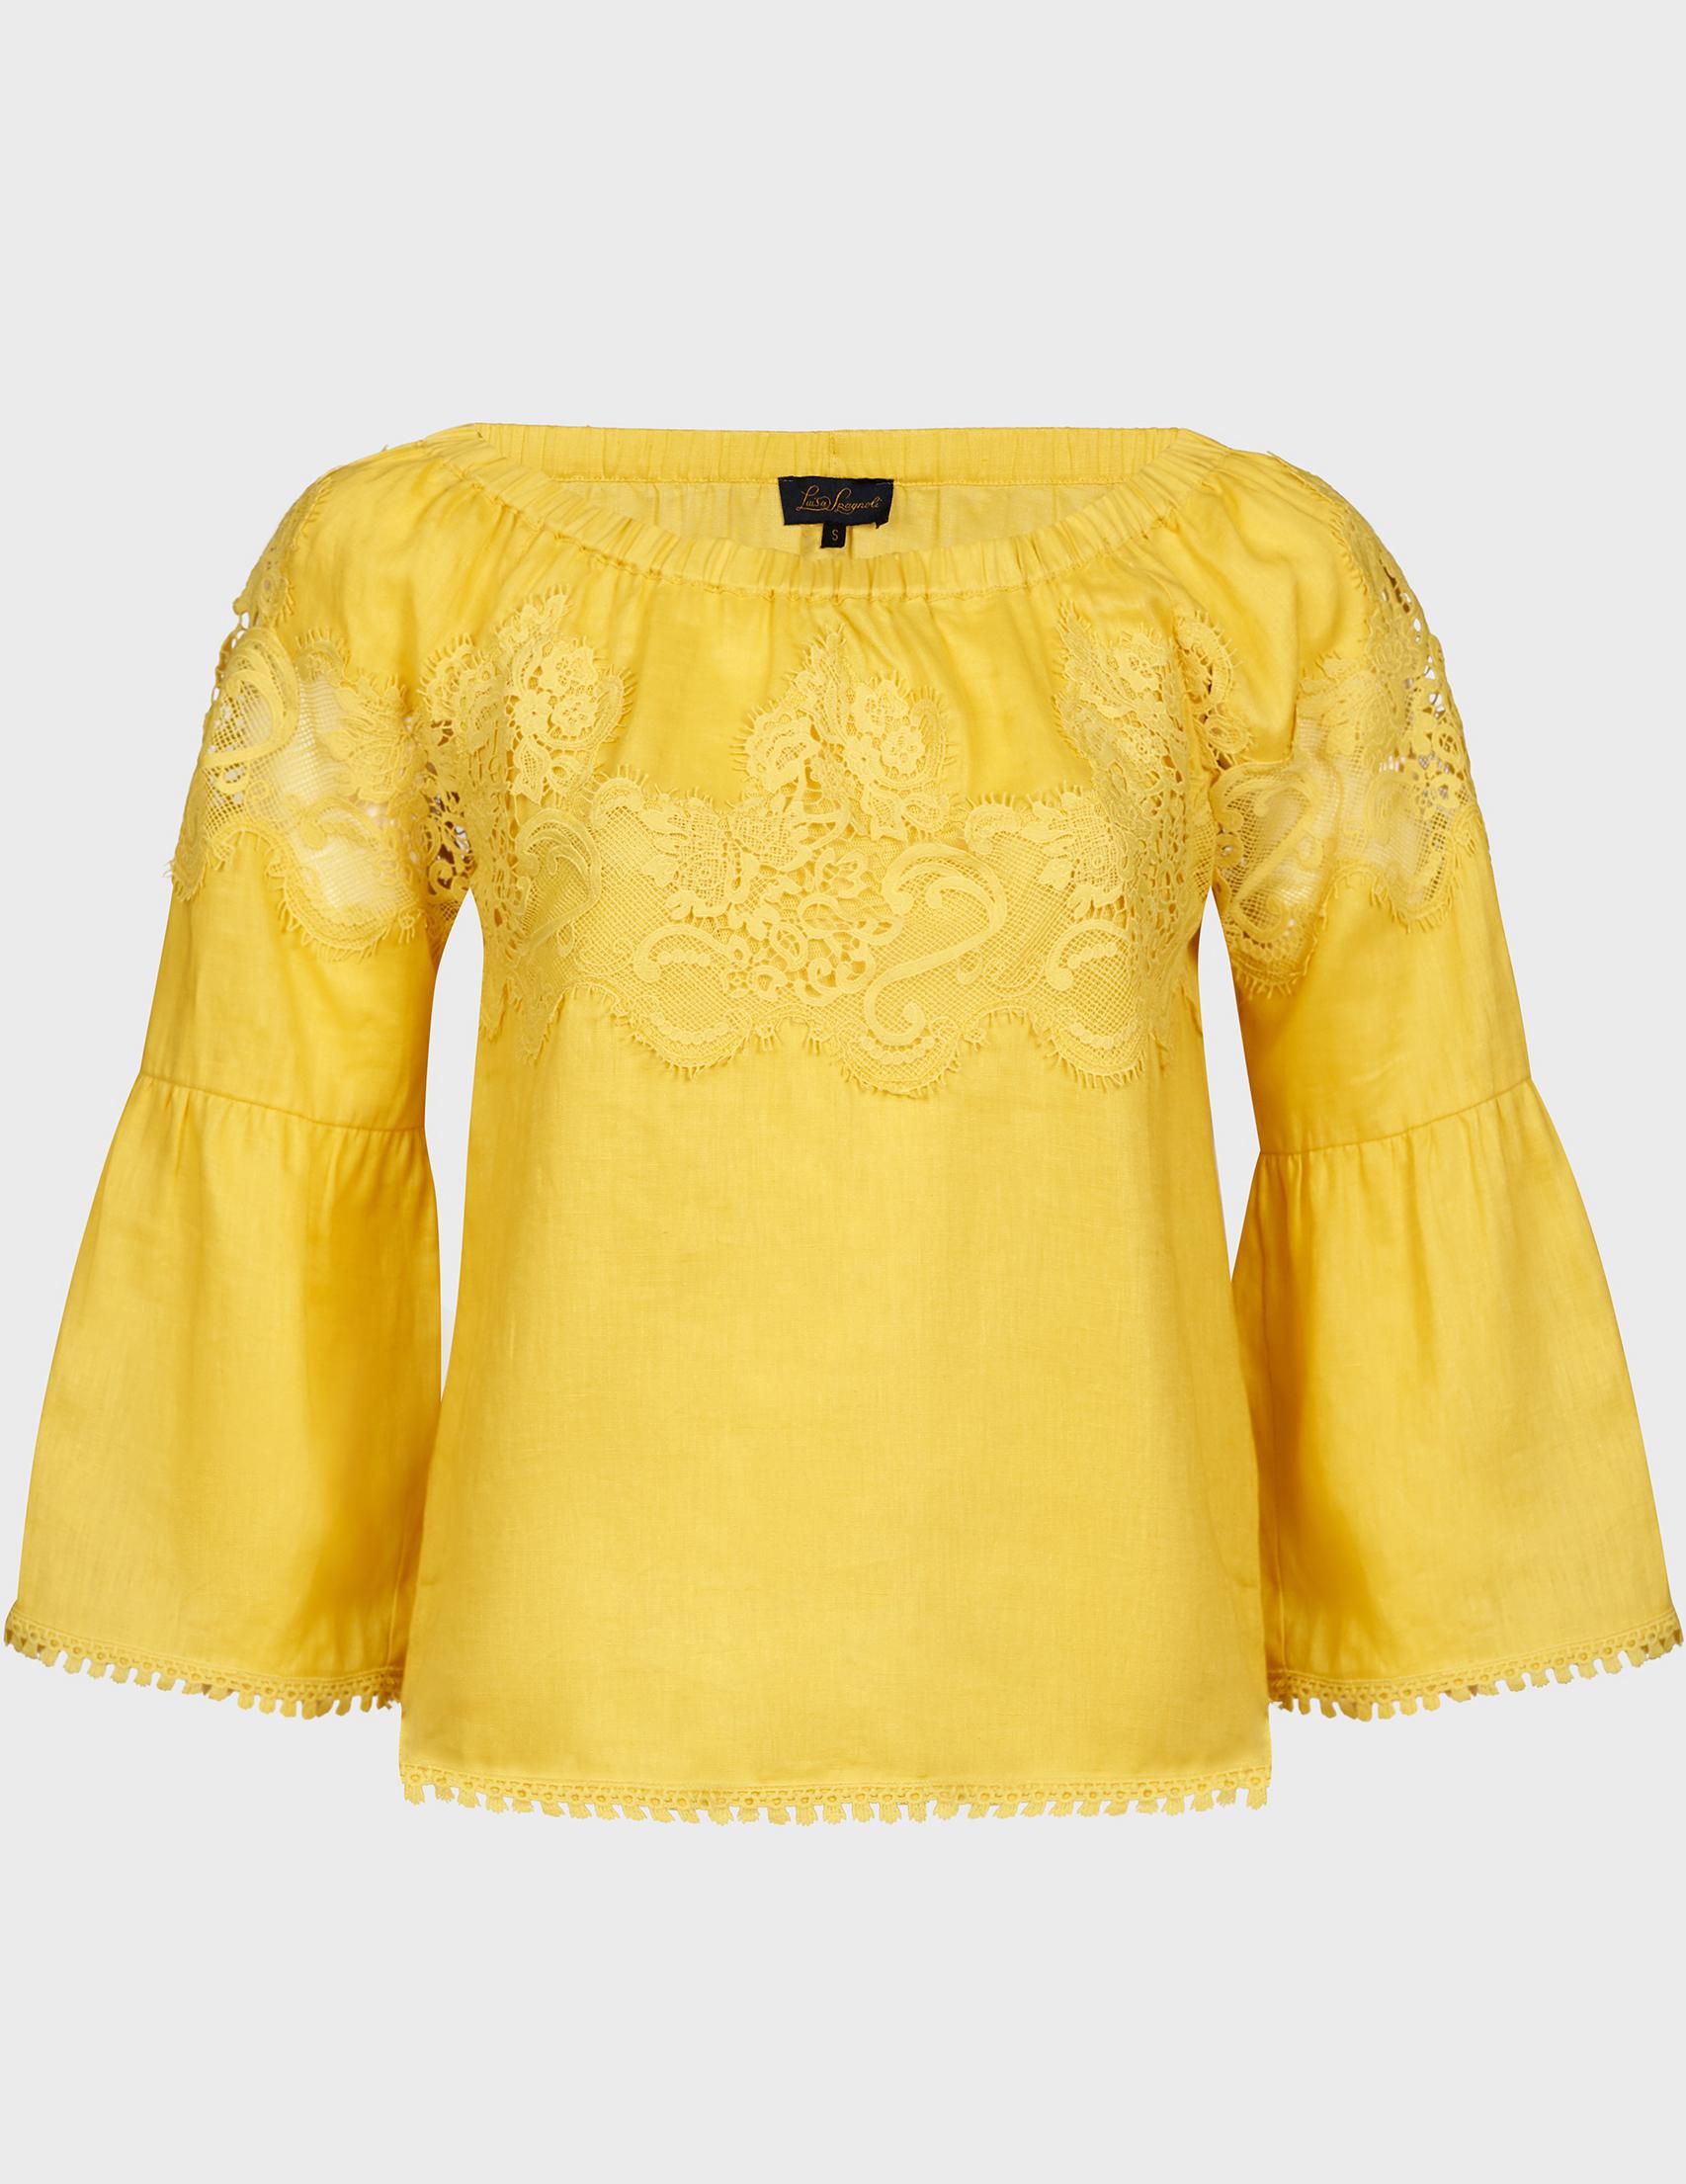 Купить Блузы, Блуза, LUISA SPAGNOLI, Желтый, 100%Лен, Весна-Лето